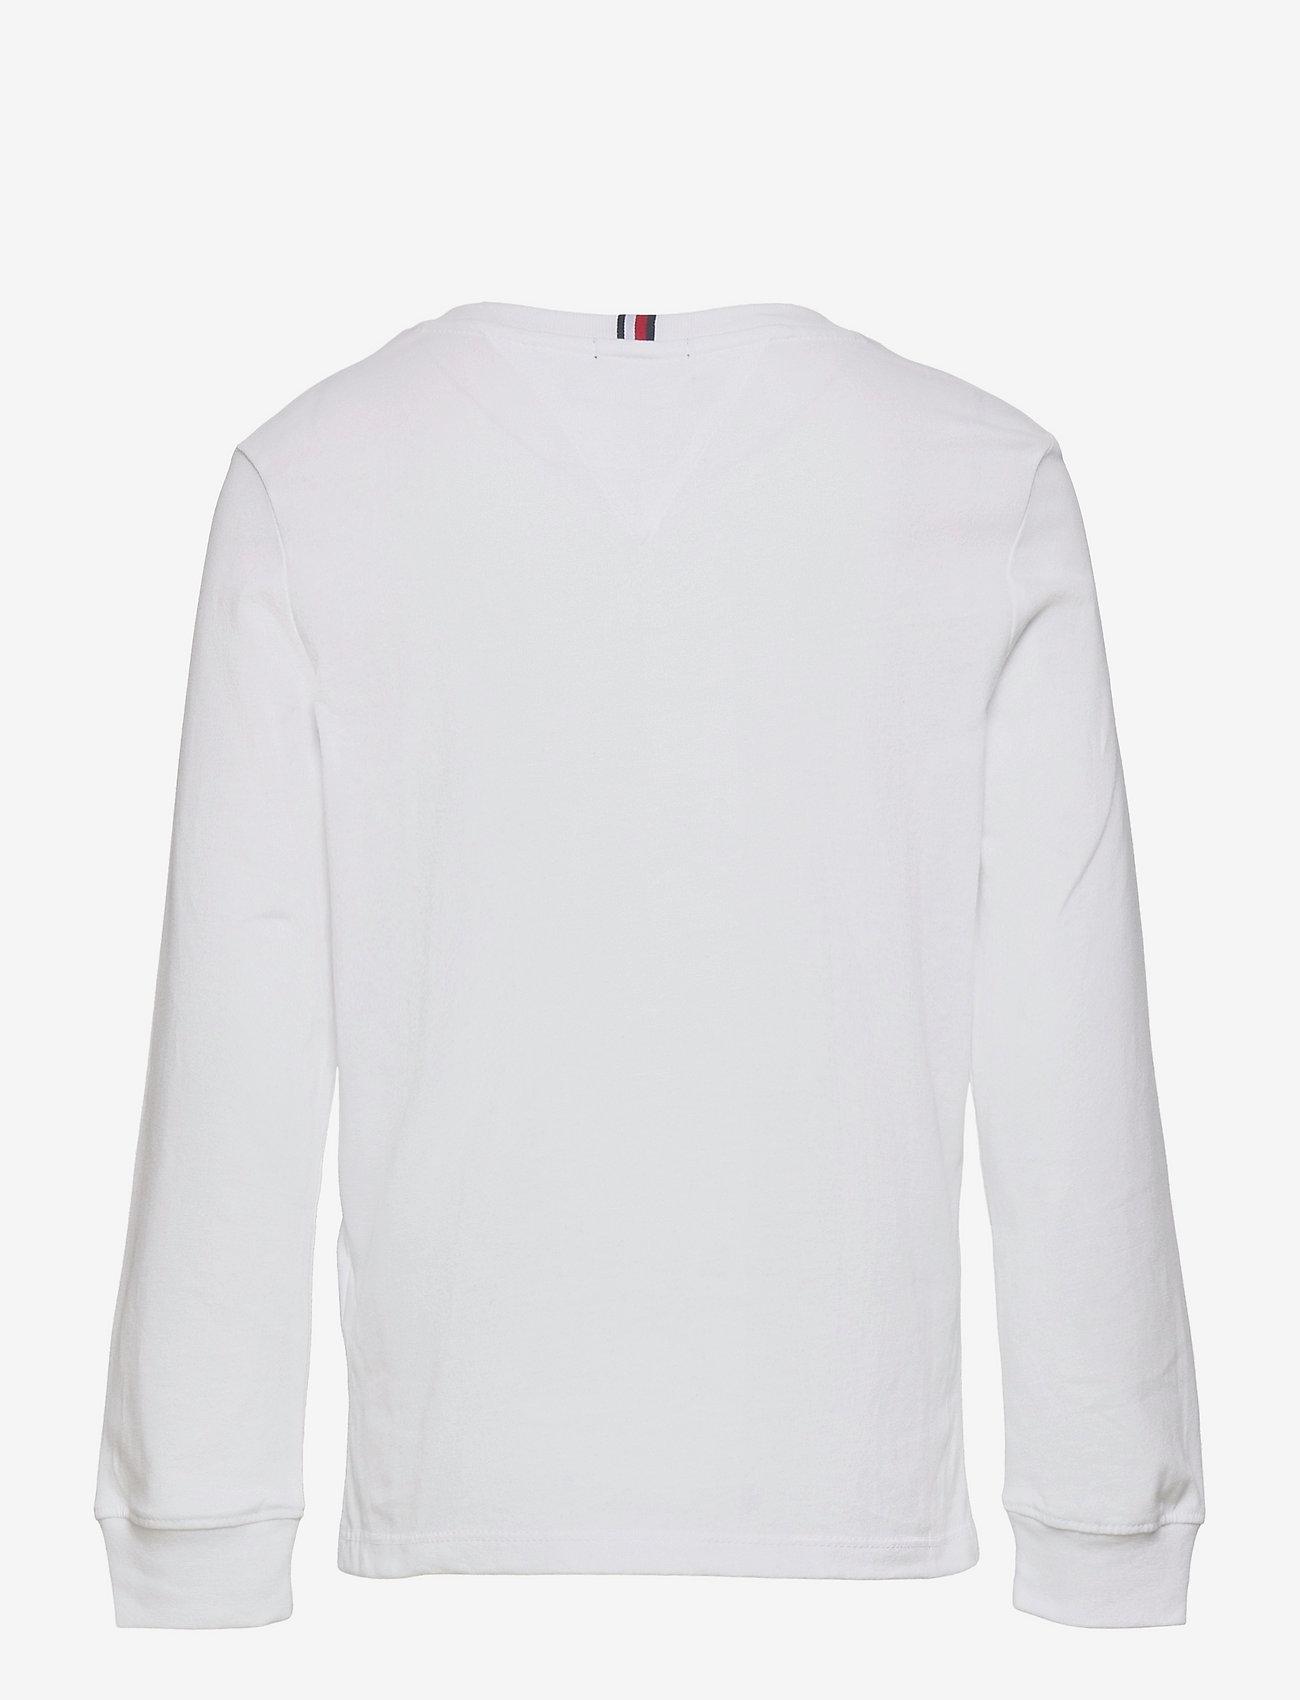 Tommy Hilfiger - TH ARTWORK TEE L/S - sweatshirts - white - 1